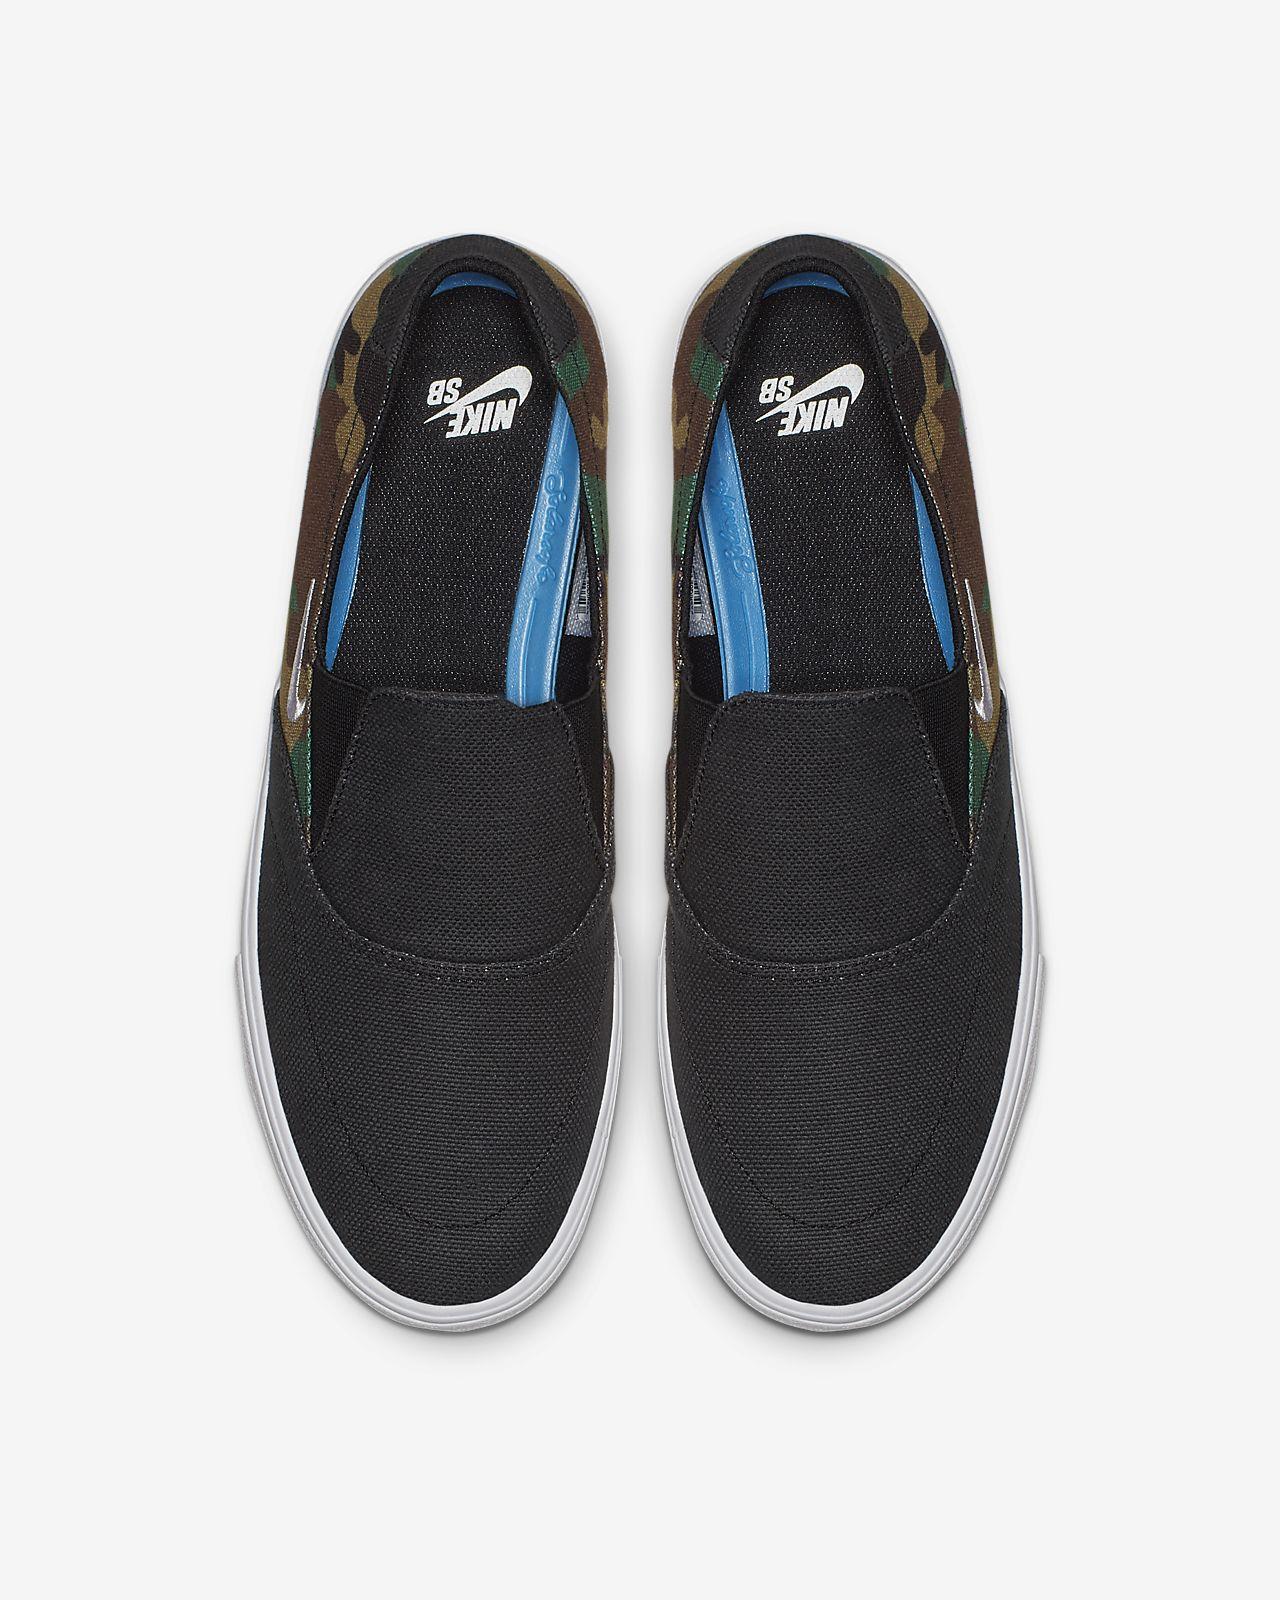 03fca164e0de9a Nike SB Portmore II Solarsoft Slip-on Men s Skateboarding Shoe. Nike ...